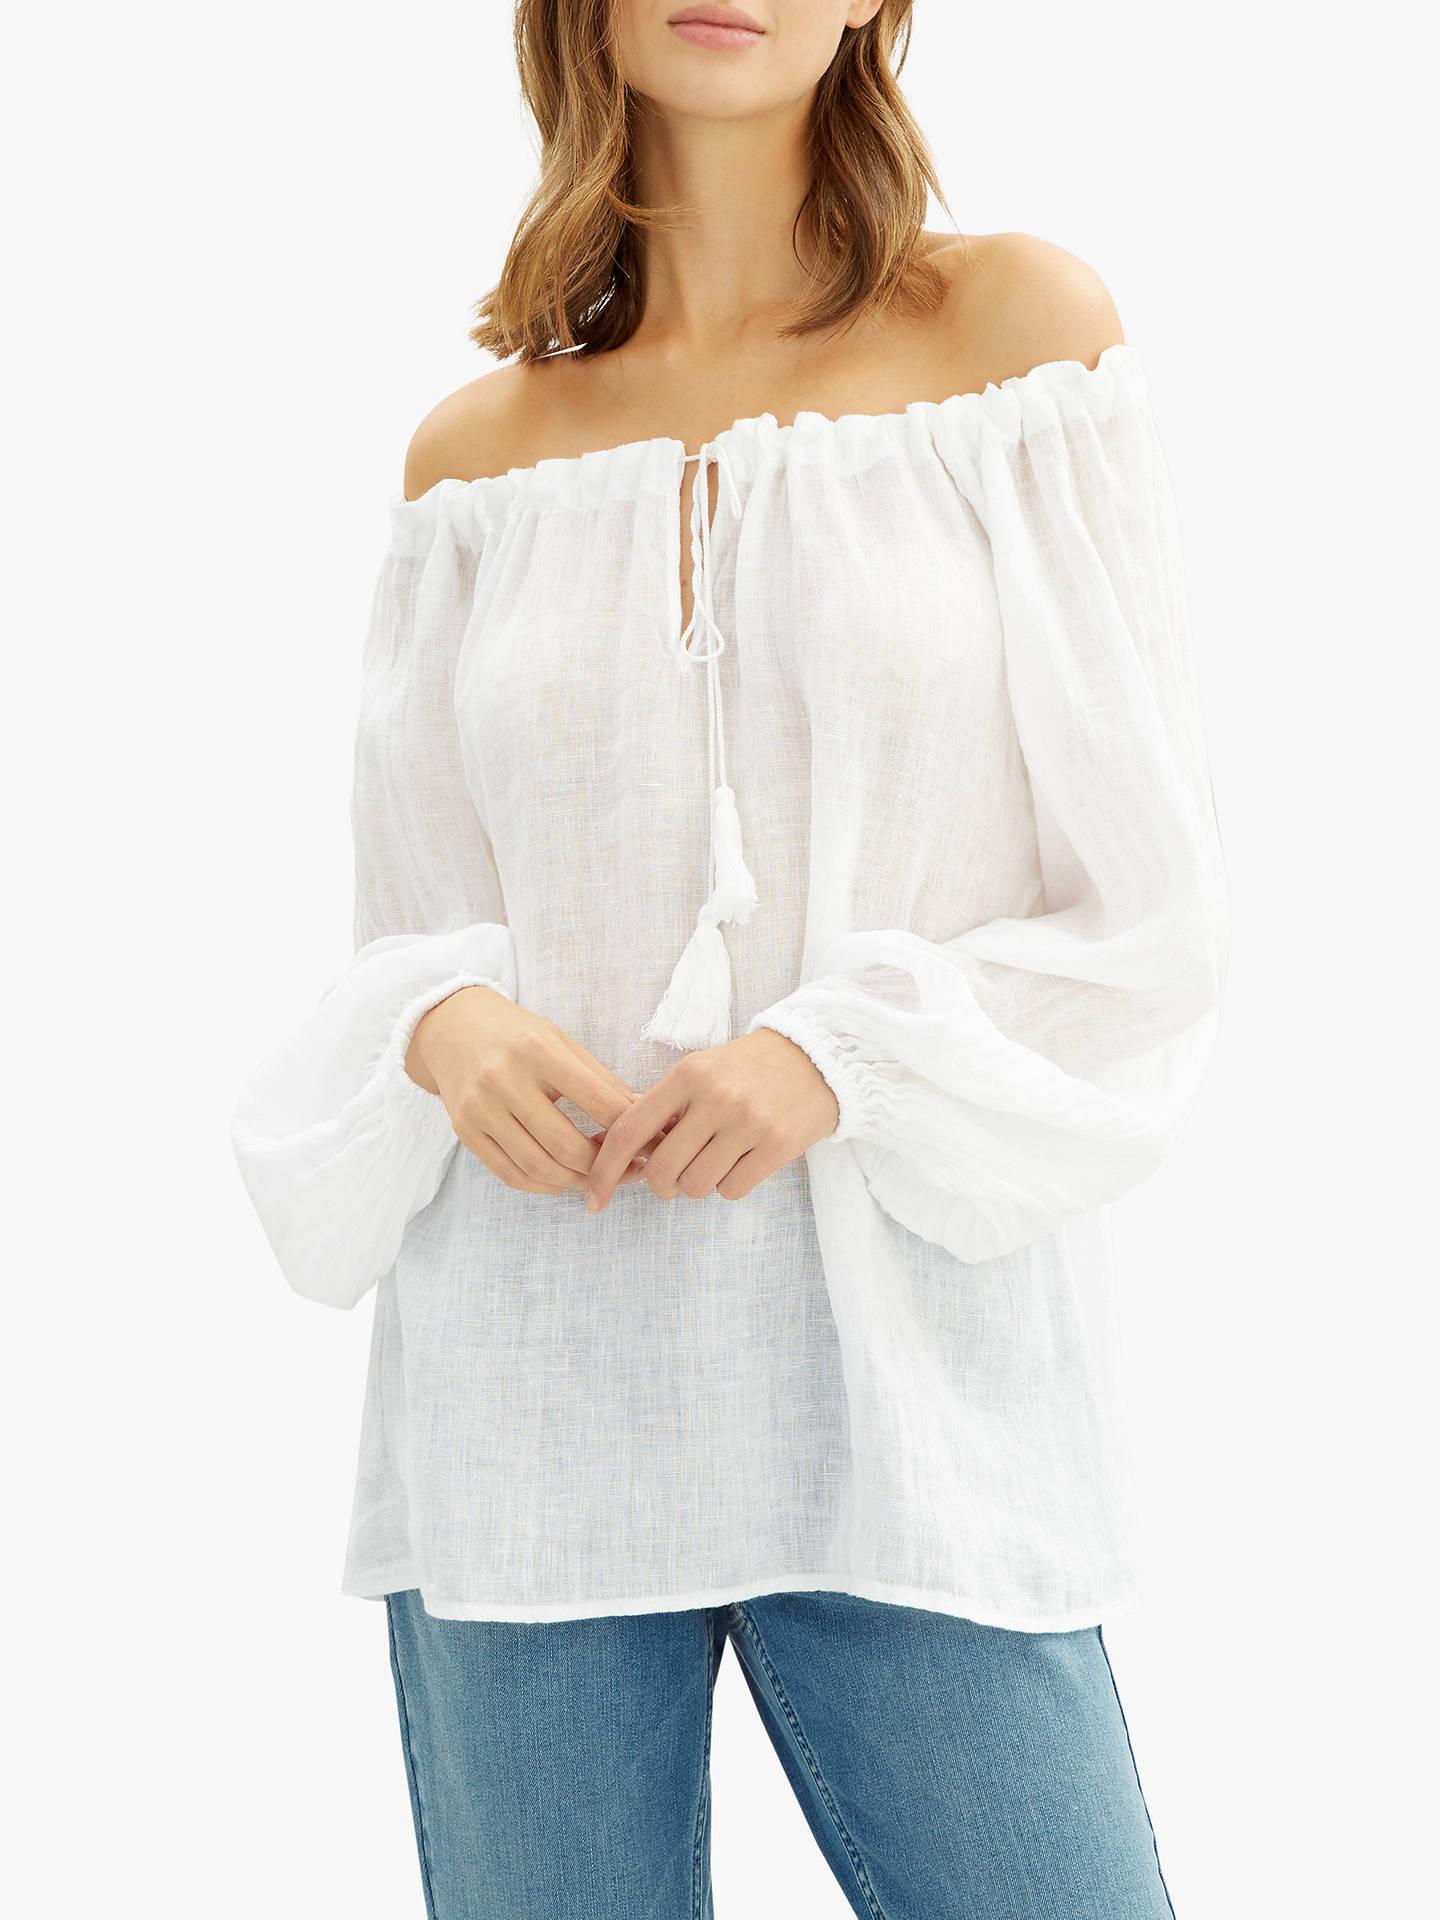 94313f03 Buy Jaeger Gauze Linen Tunic, White, 6 Online at johnlewis.com ...